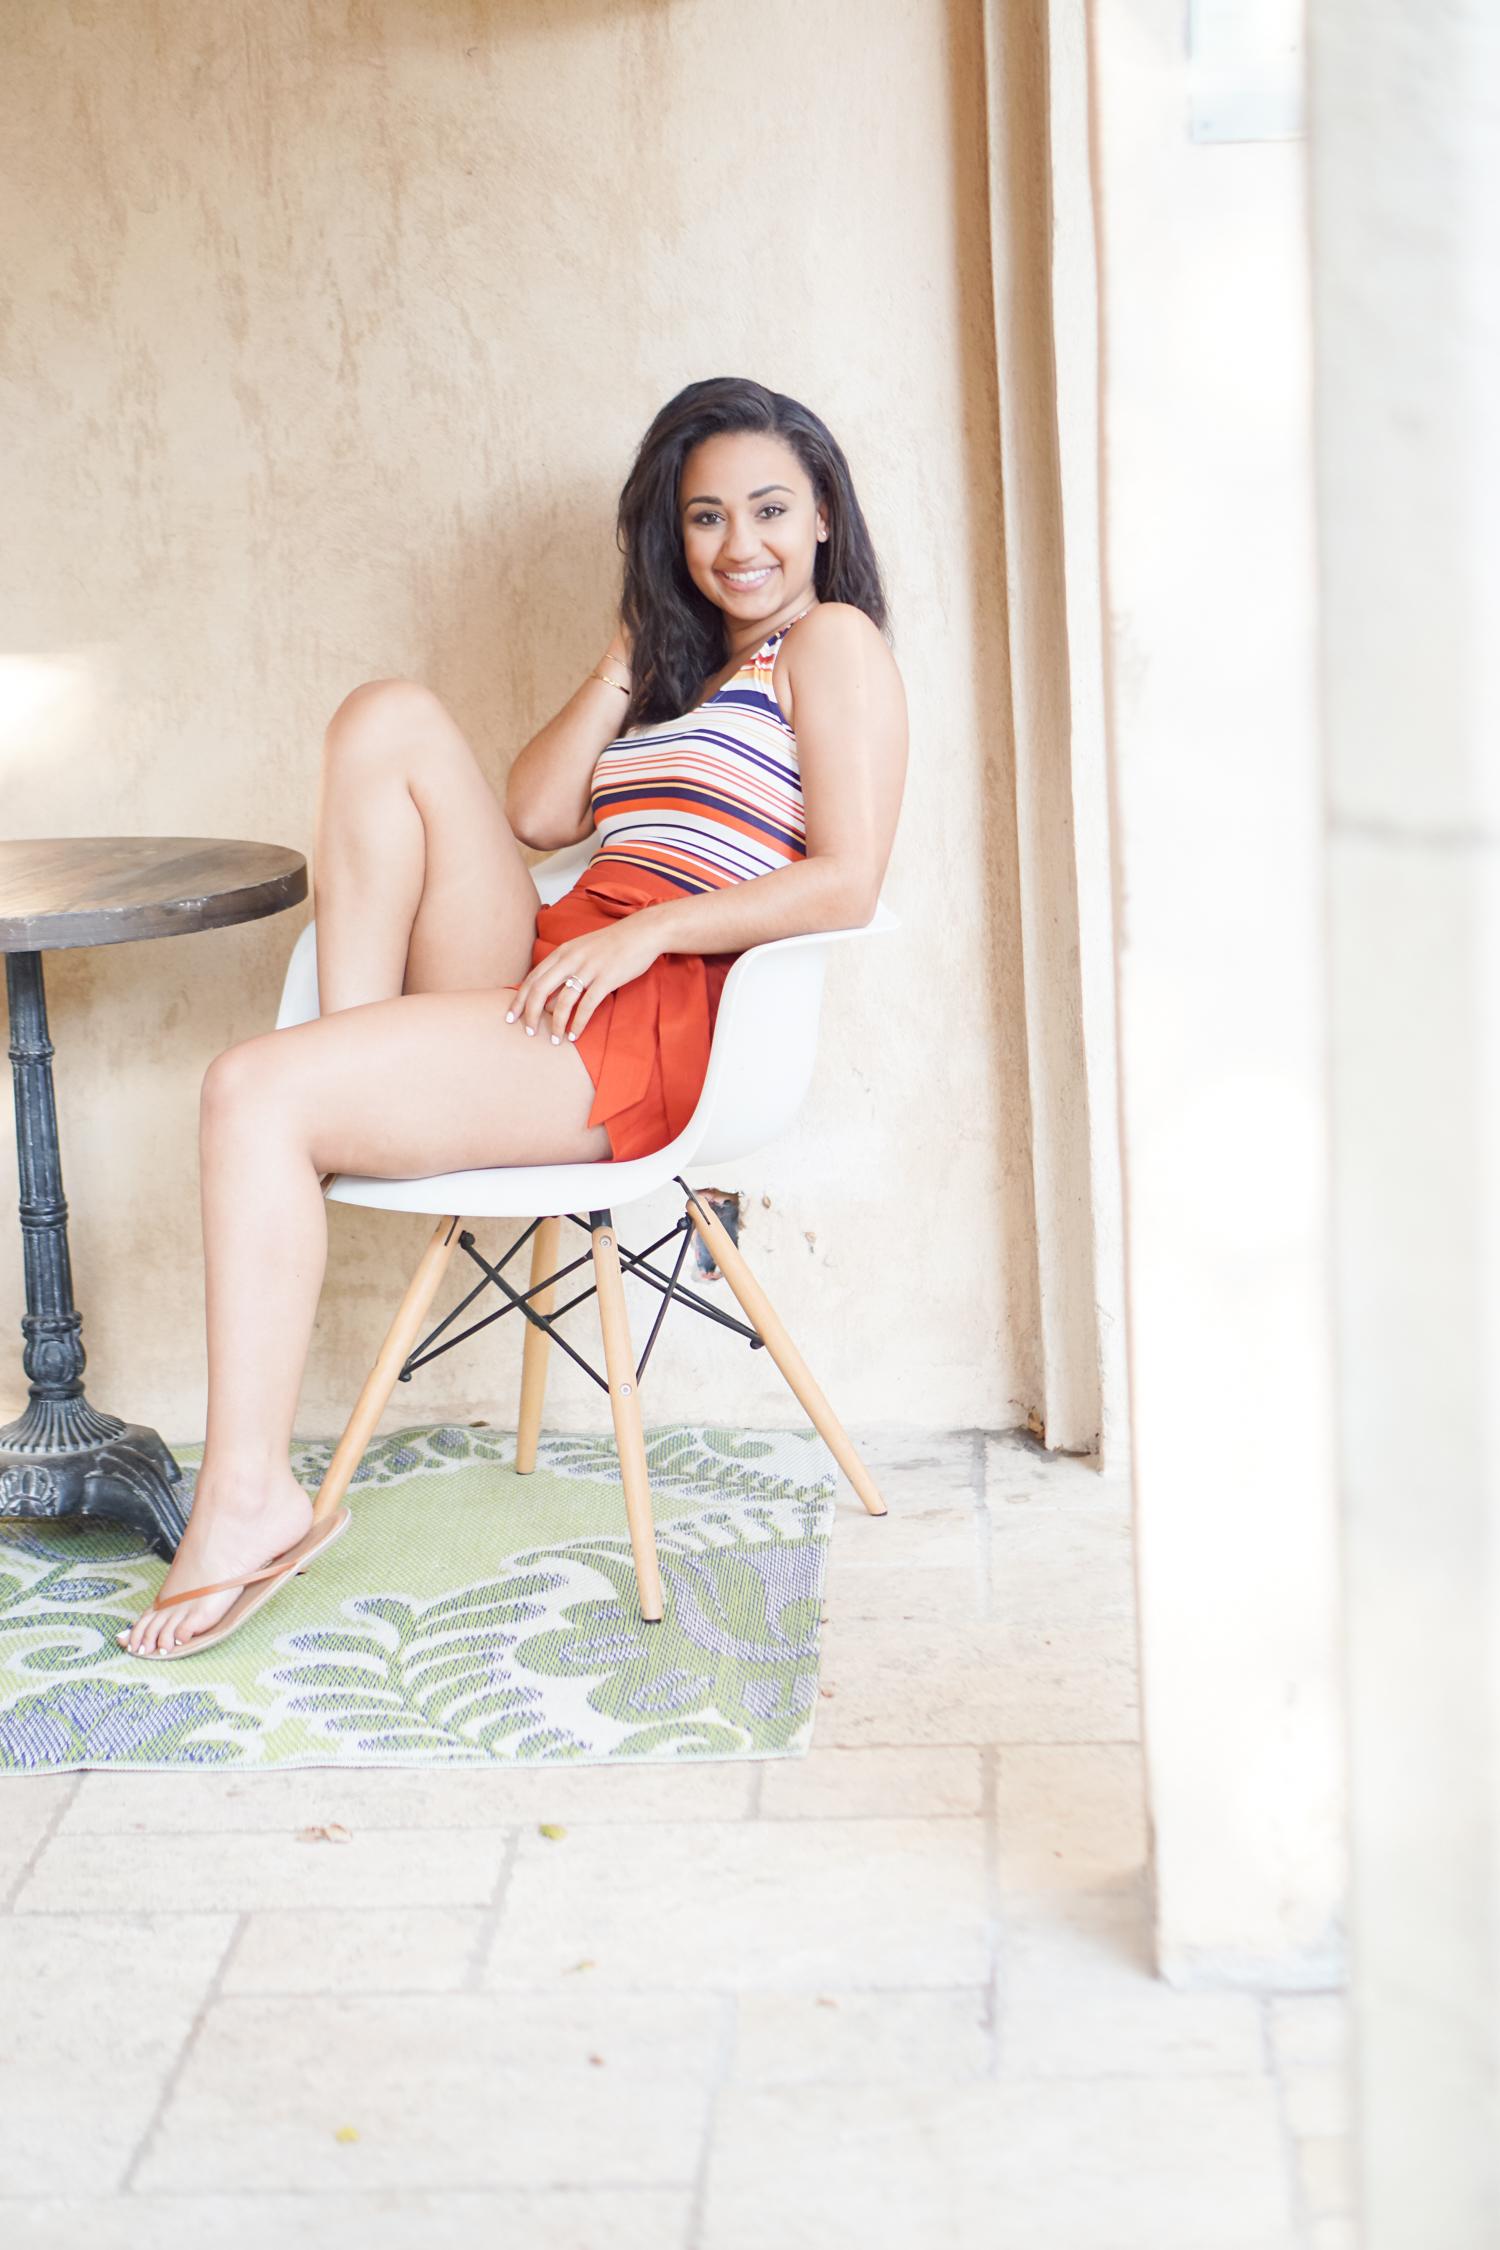 How the Blogging Industry Affects Women- Monique Mchugh Blog